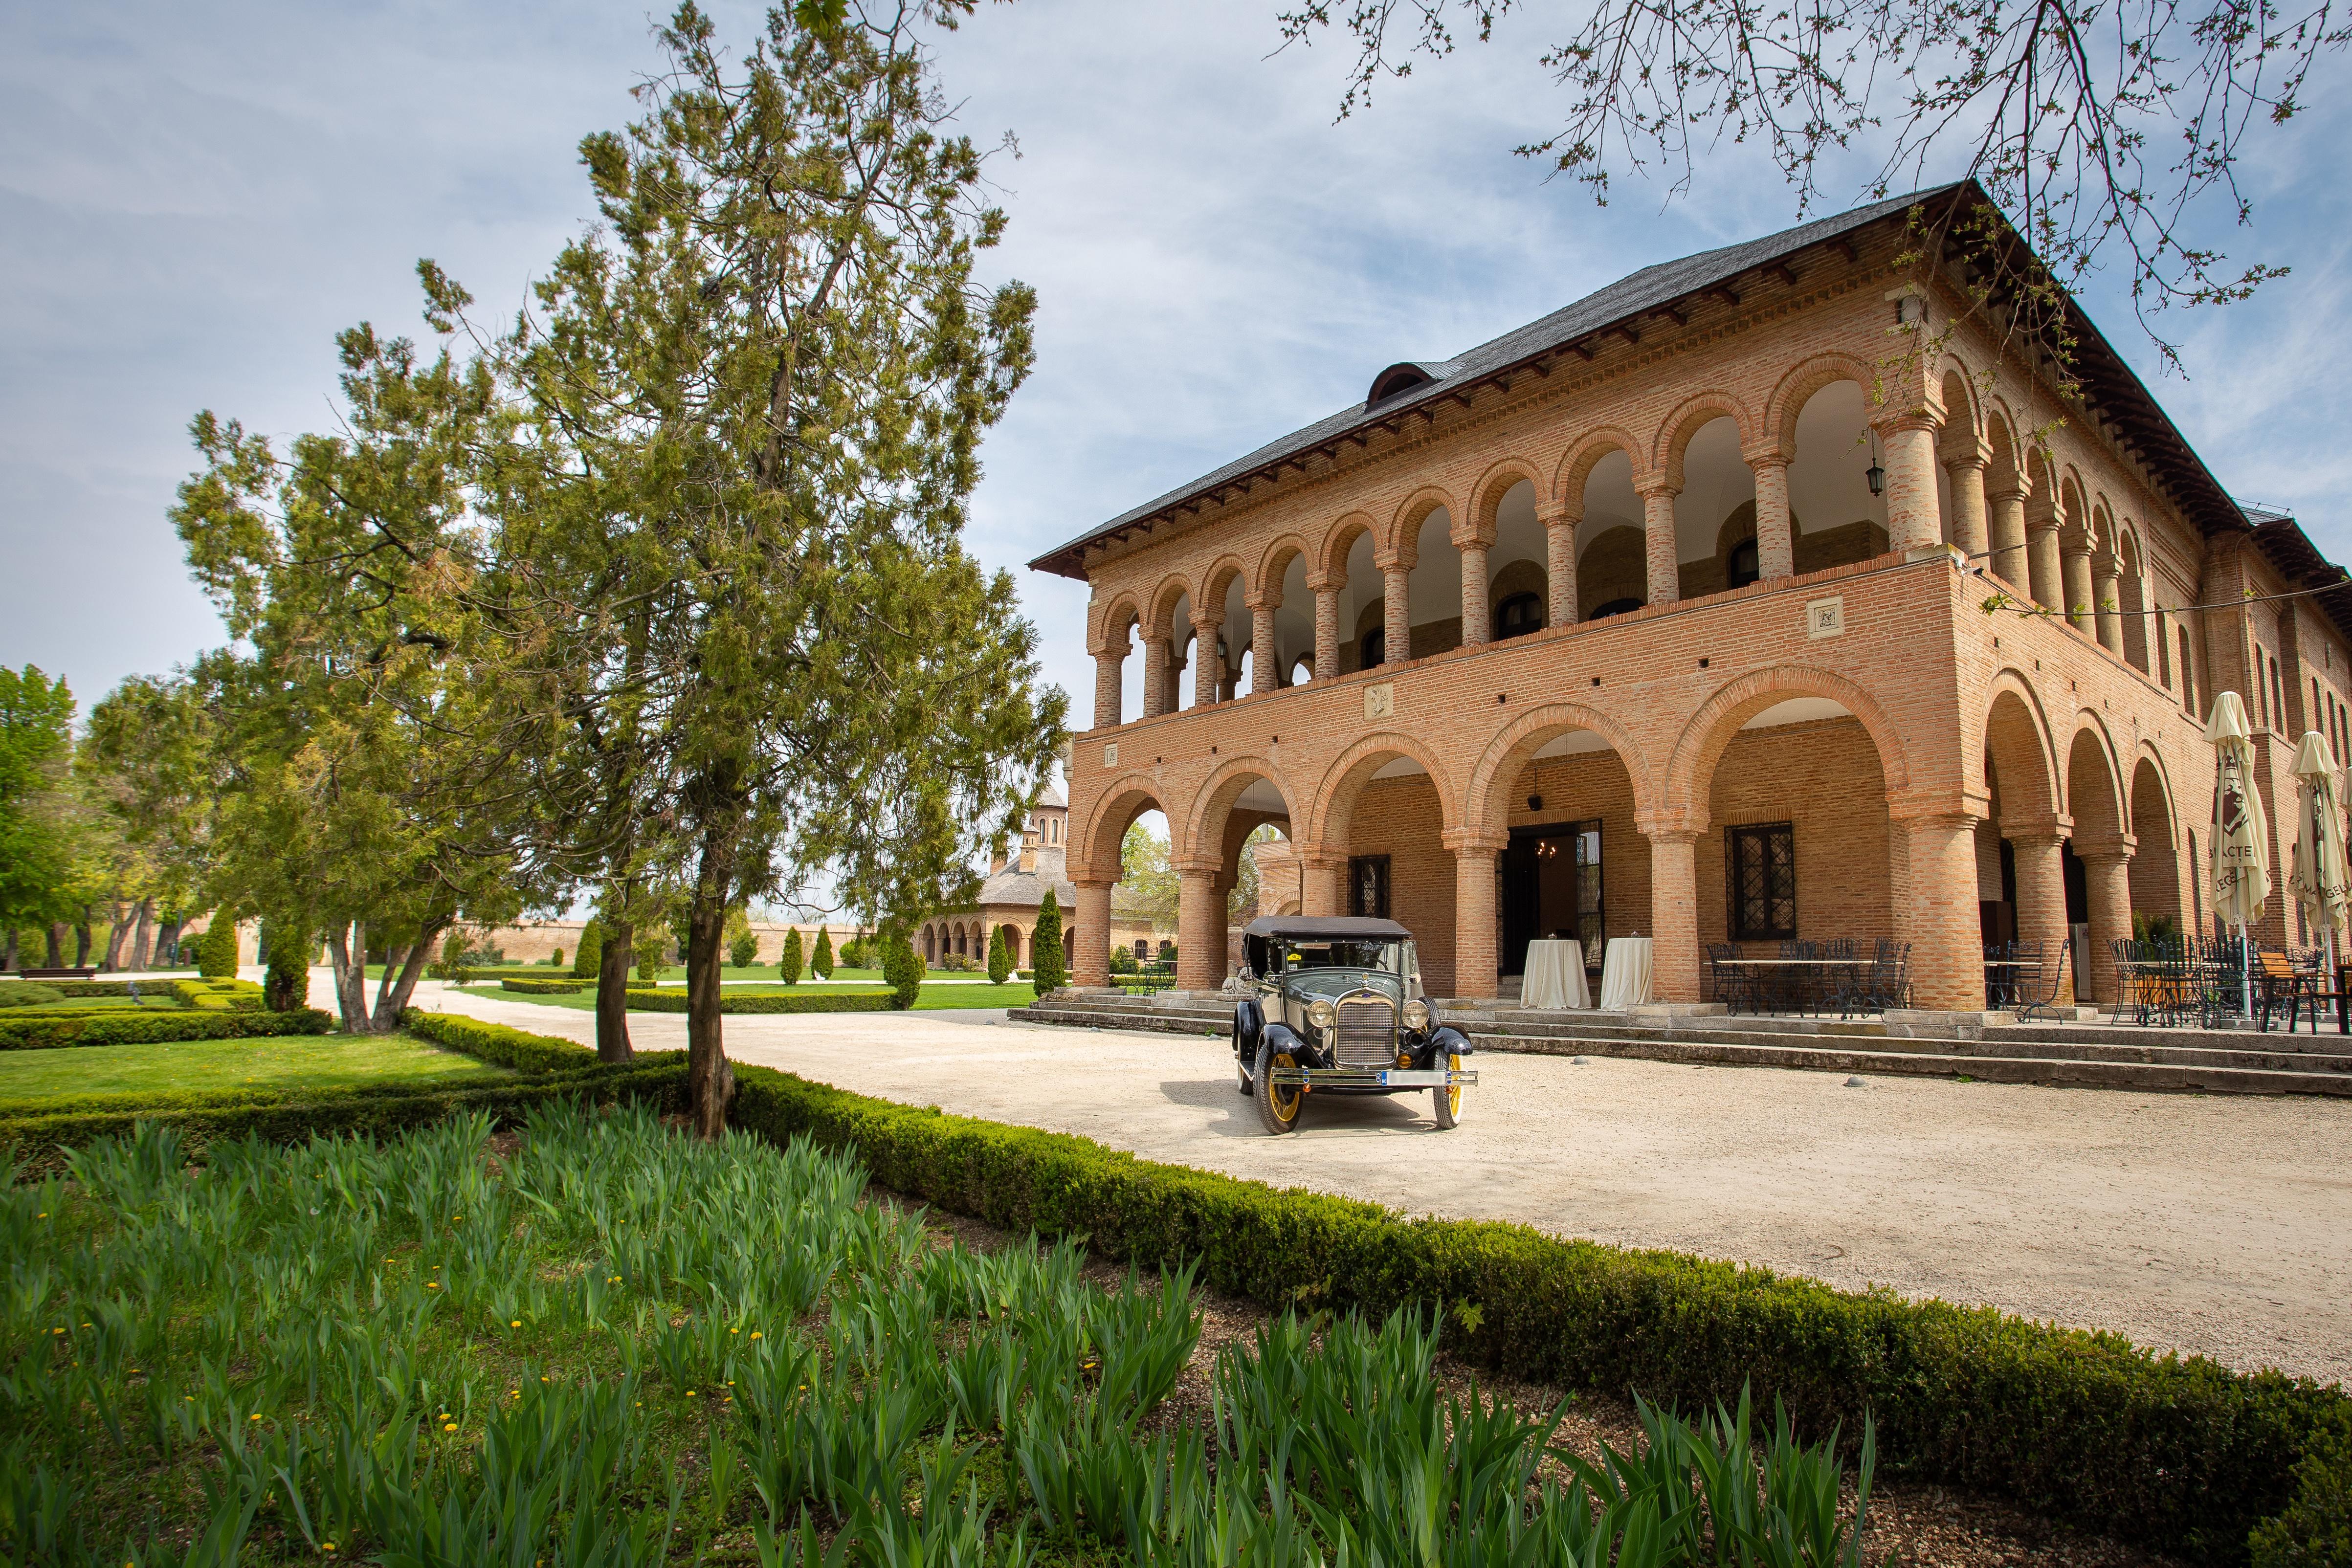 botezul la Palatul Mogosoaia